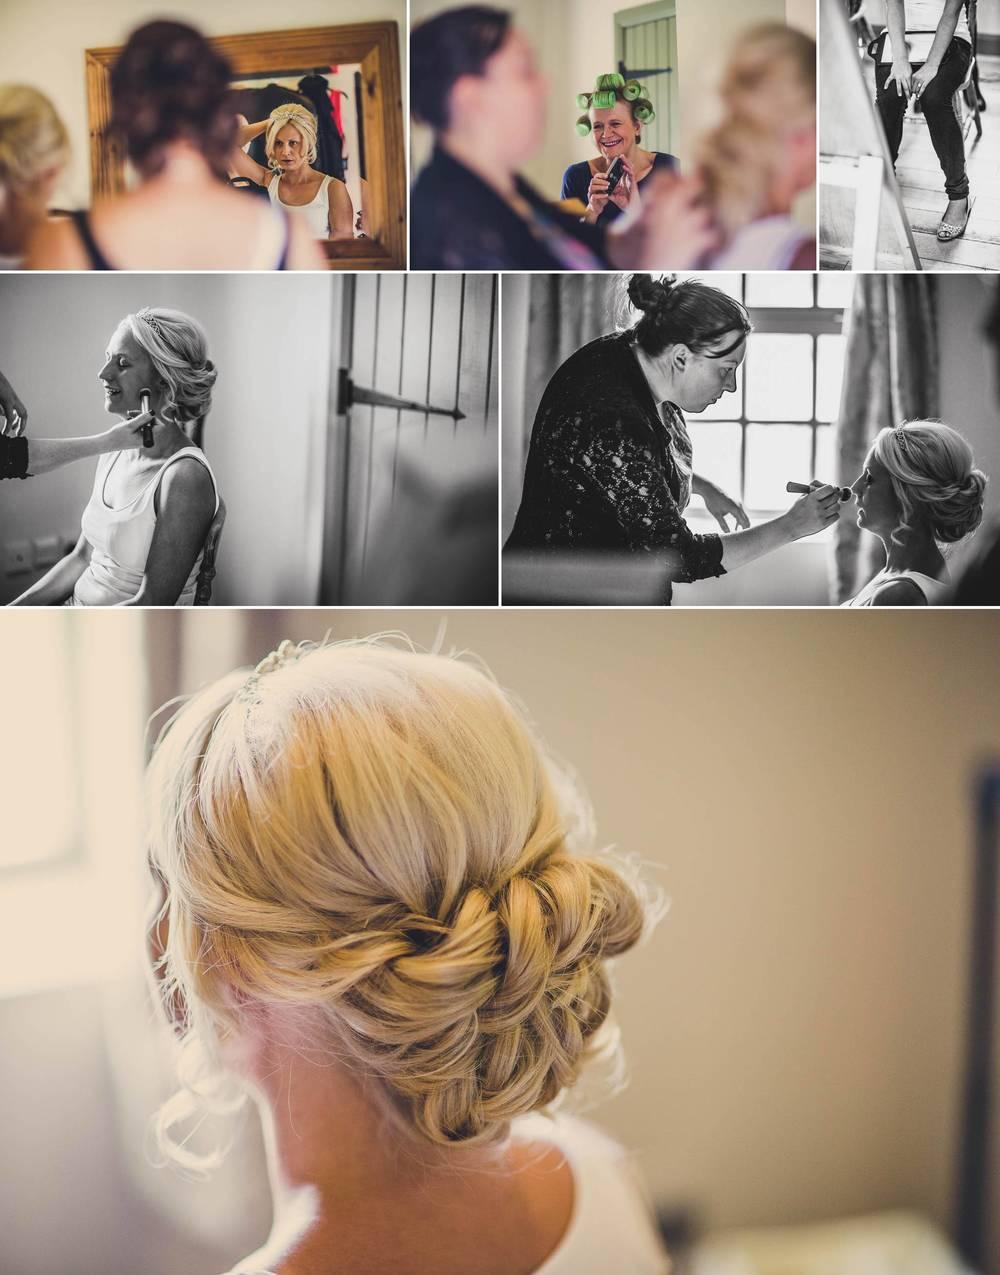 the-ashes-wedding-photographer 5.jpg